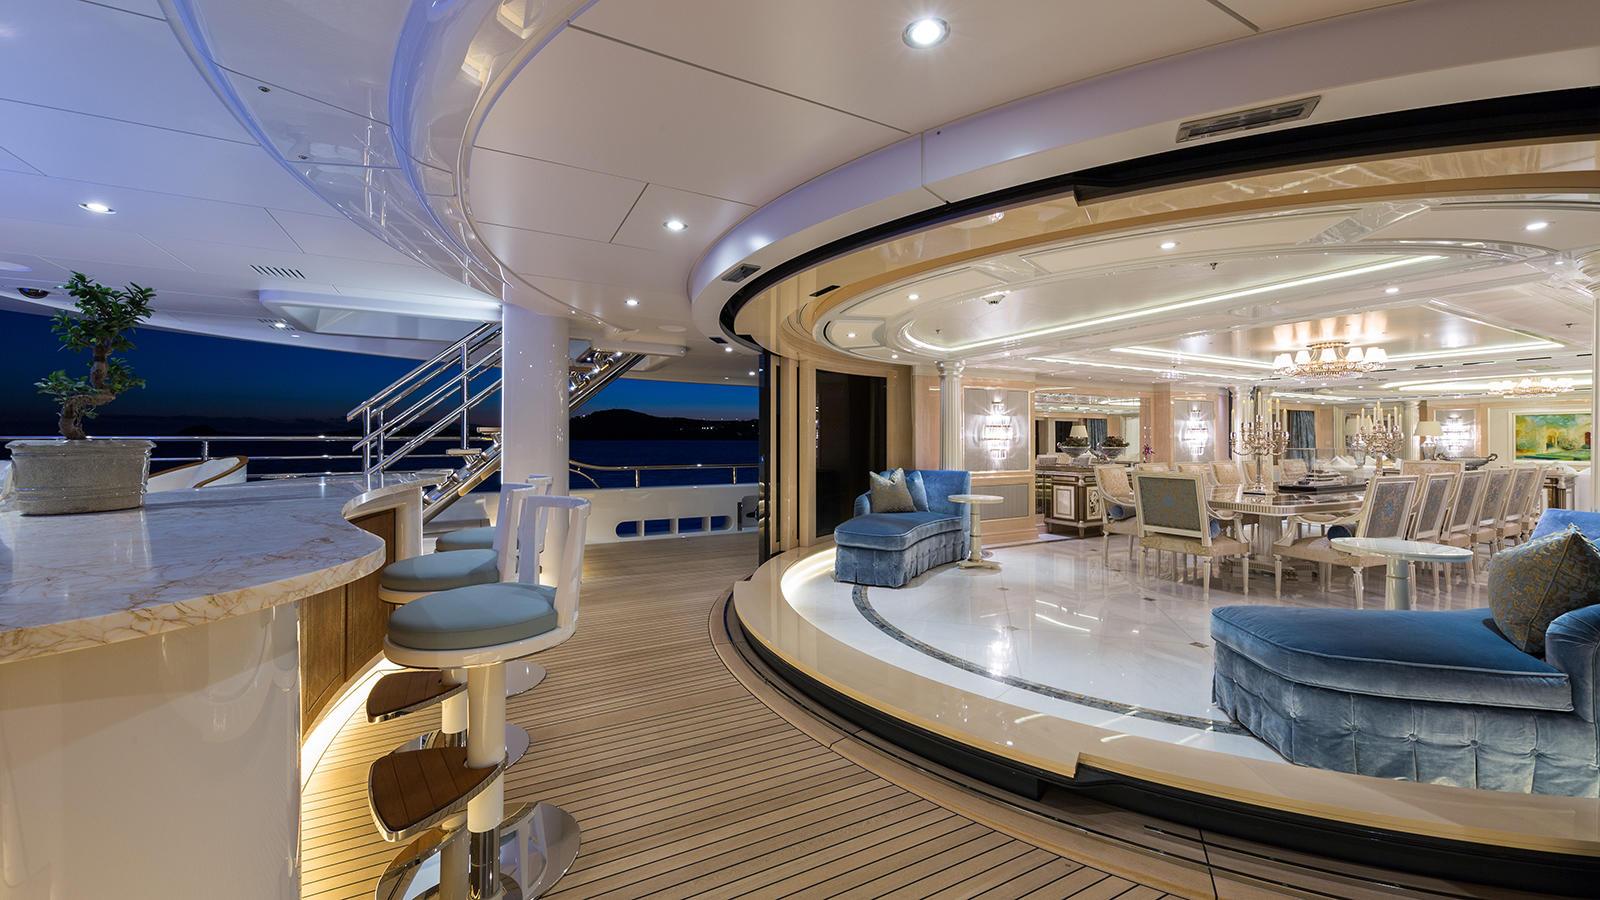 dxVRlTOS6q1bDWSAgAhA_Plvs-Vltra-Amels-LE242-yacht-dining-area-credit-Jeff-Brown-1600x900